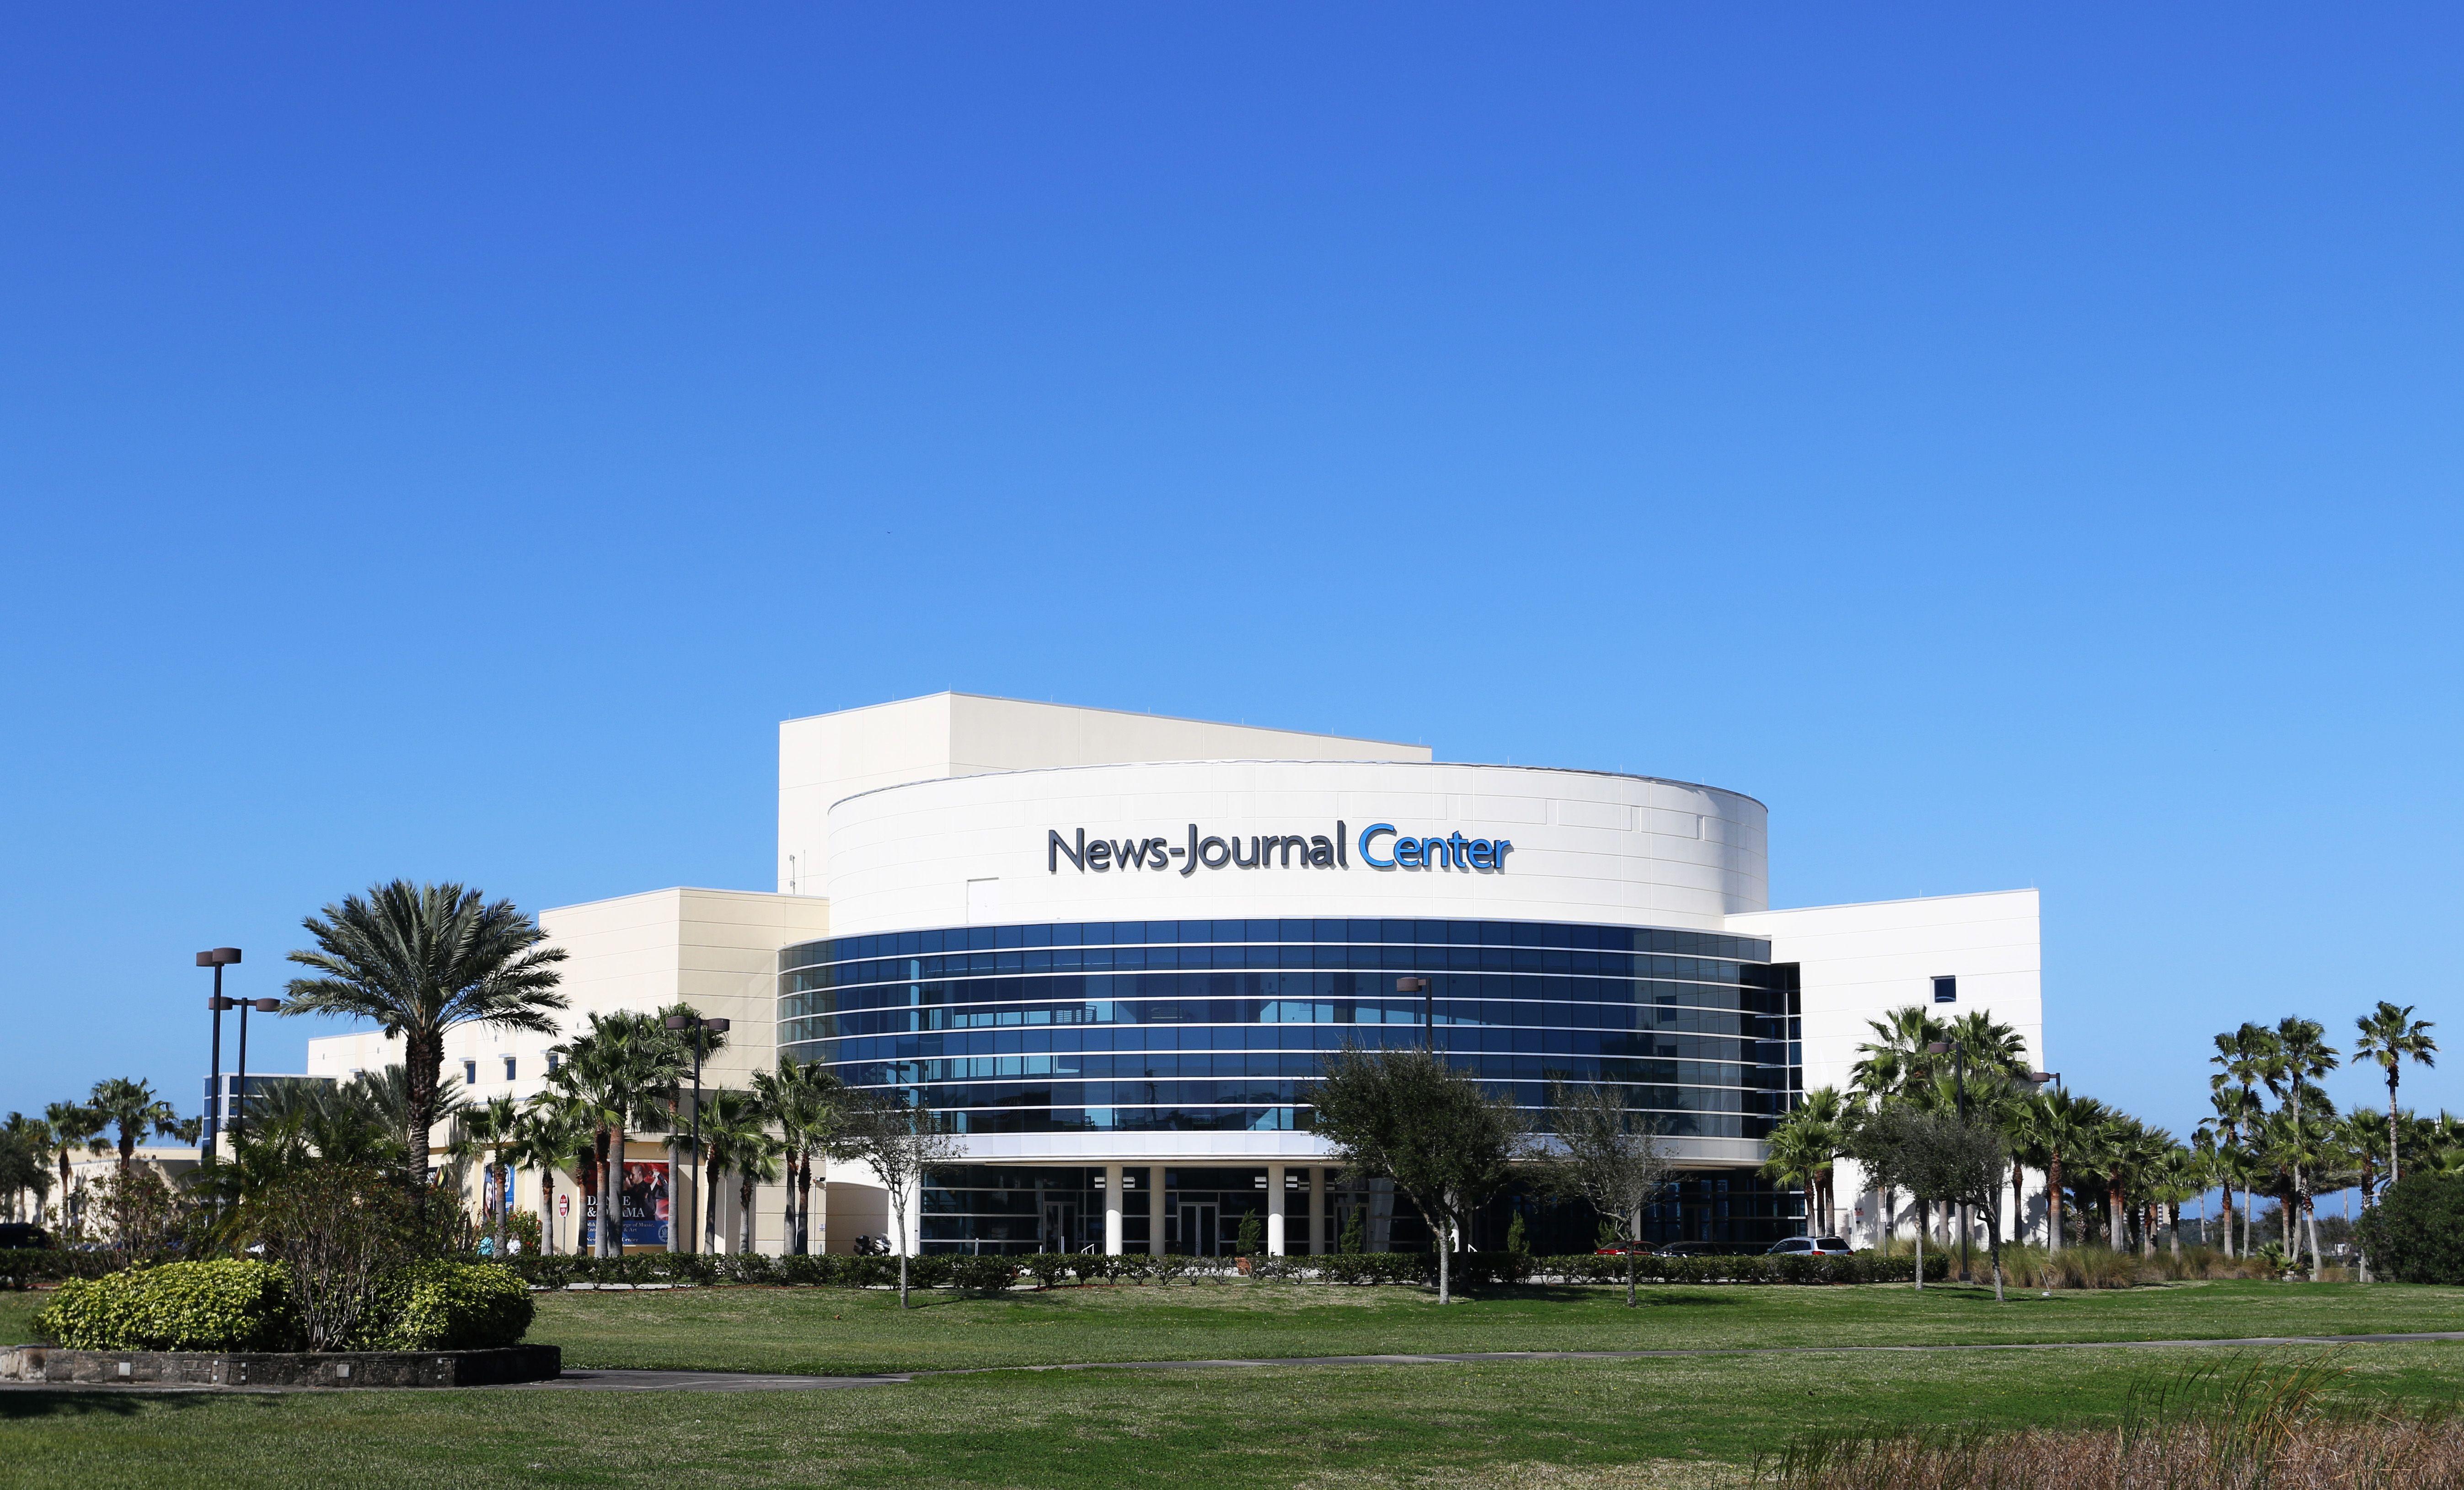 News Journal Building Daytona Beach, FL 2014. Florida